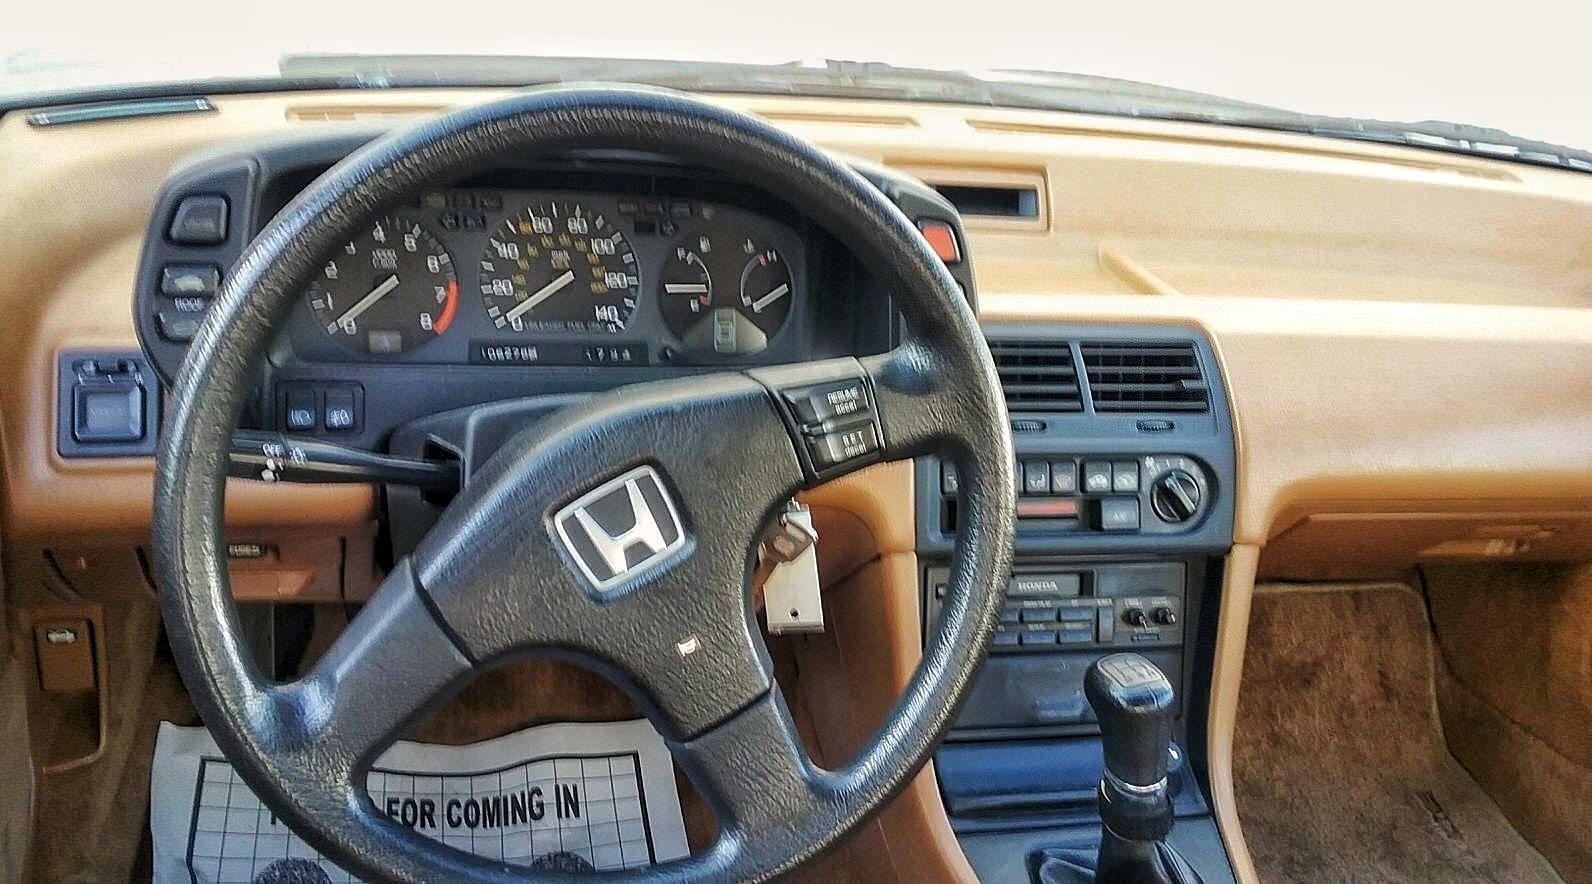 Honda Prelude With Images Honda Prelude Honda Barn Finds